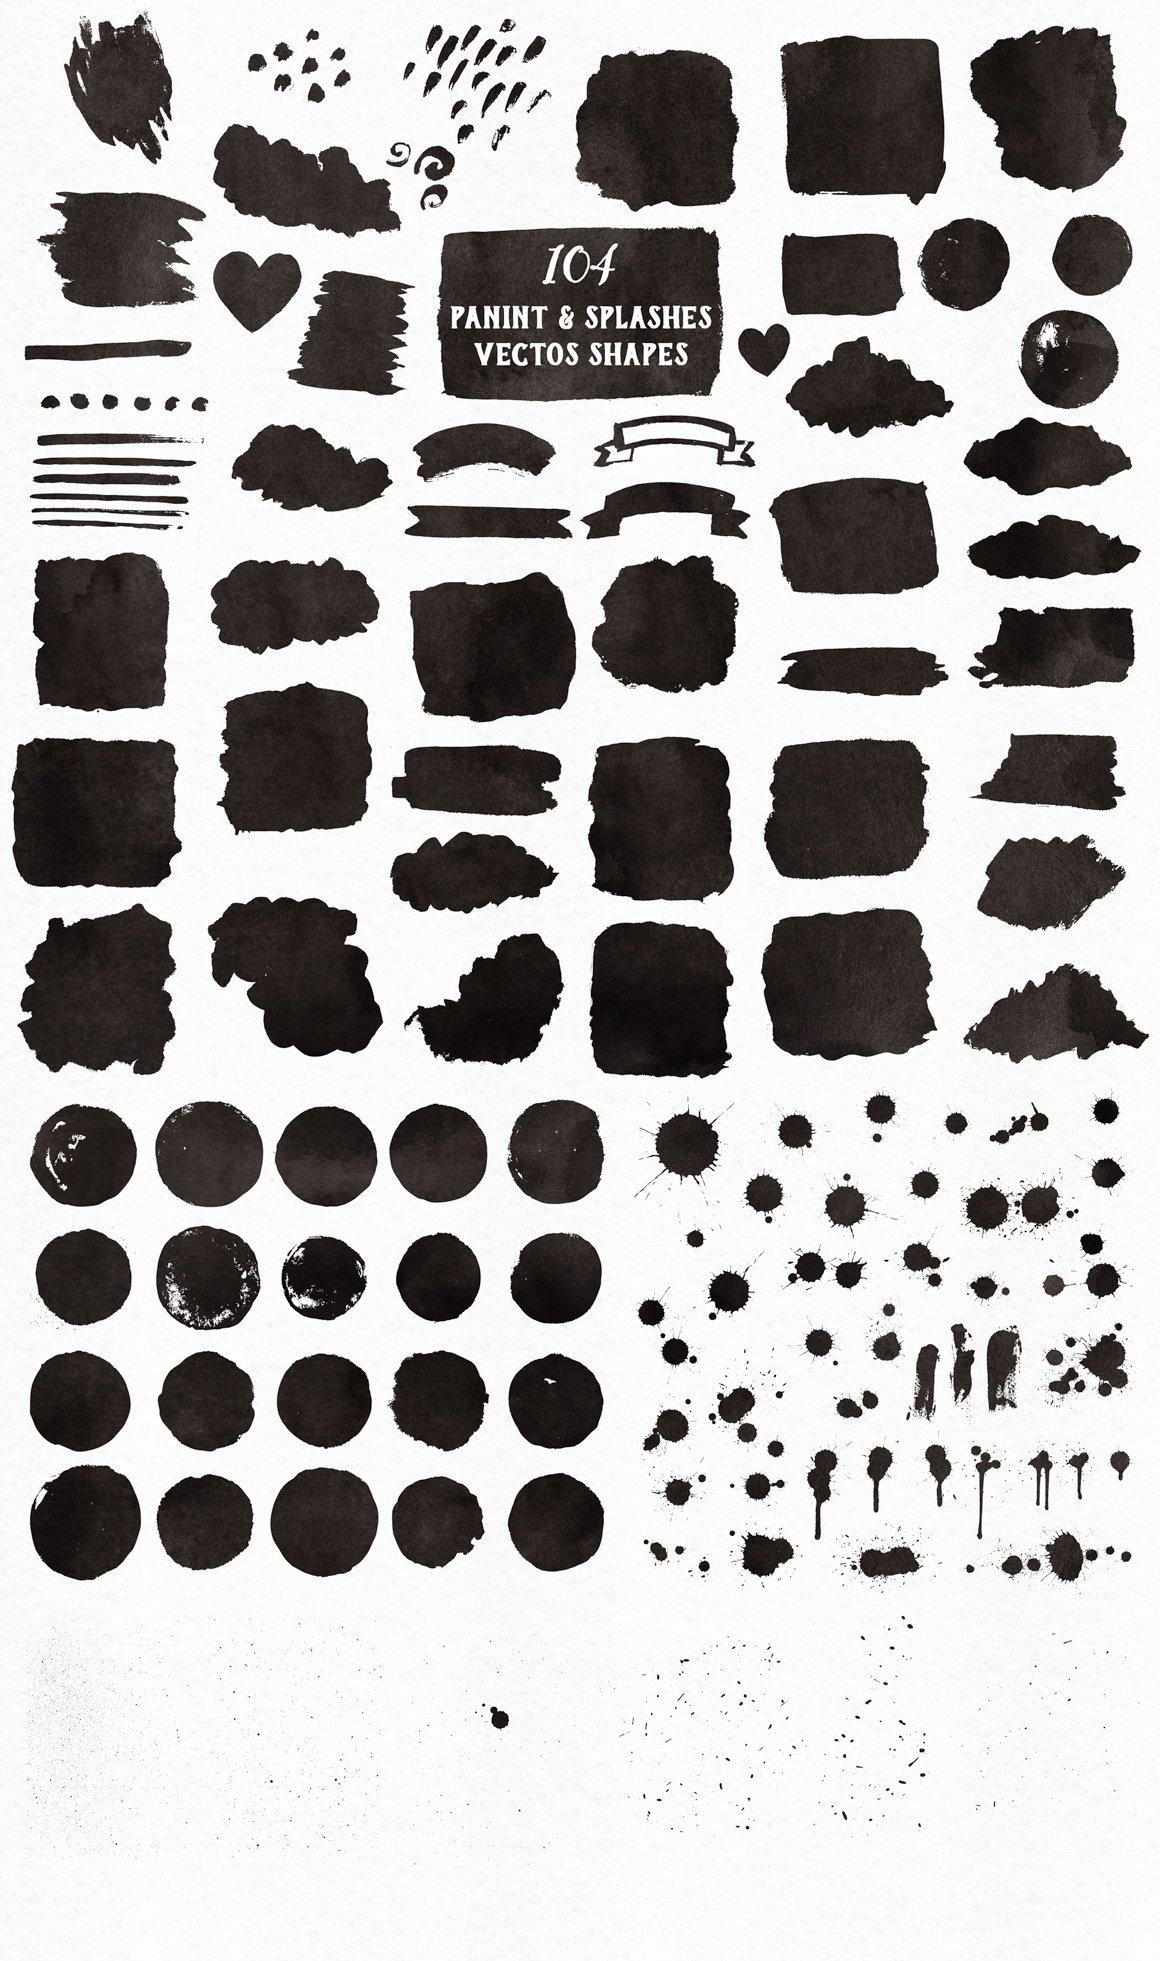 700多个木材大理石空间水彩纹理工具包 New Watercolor Texture Toolkit插图(6)